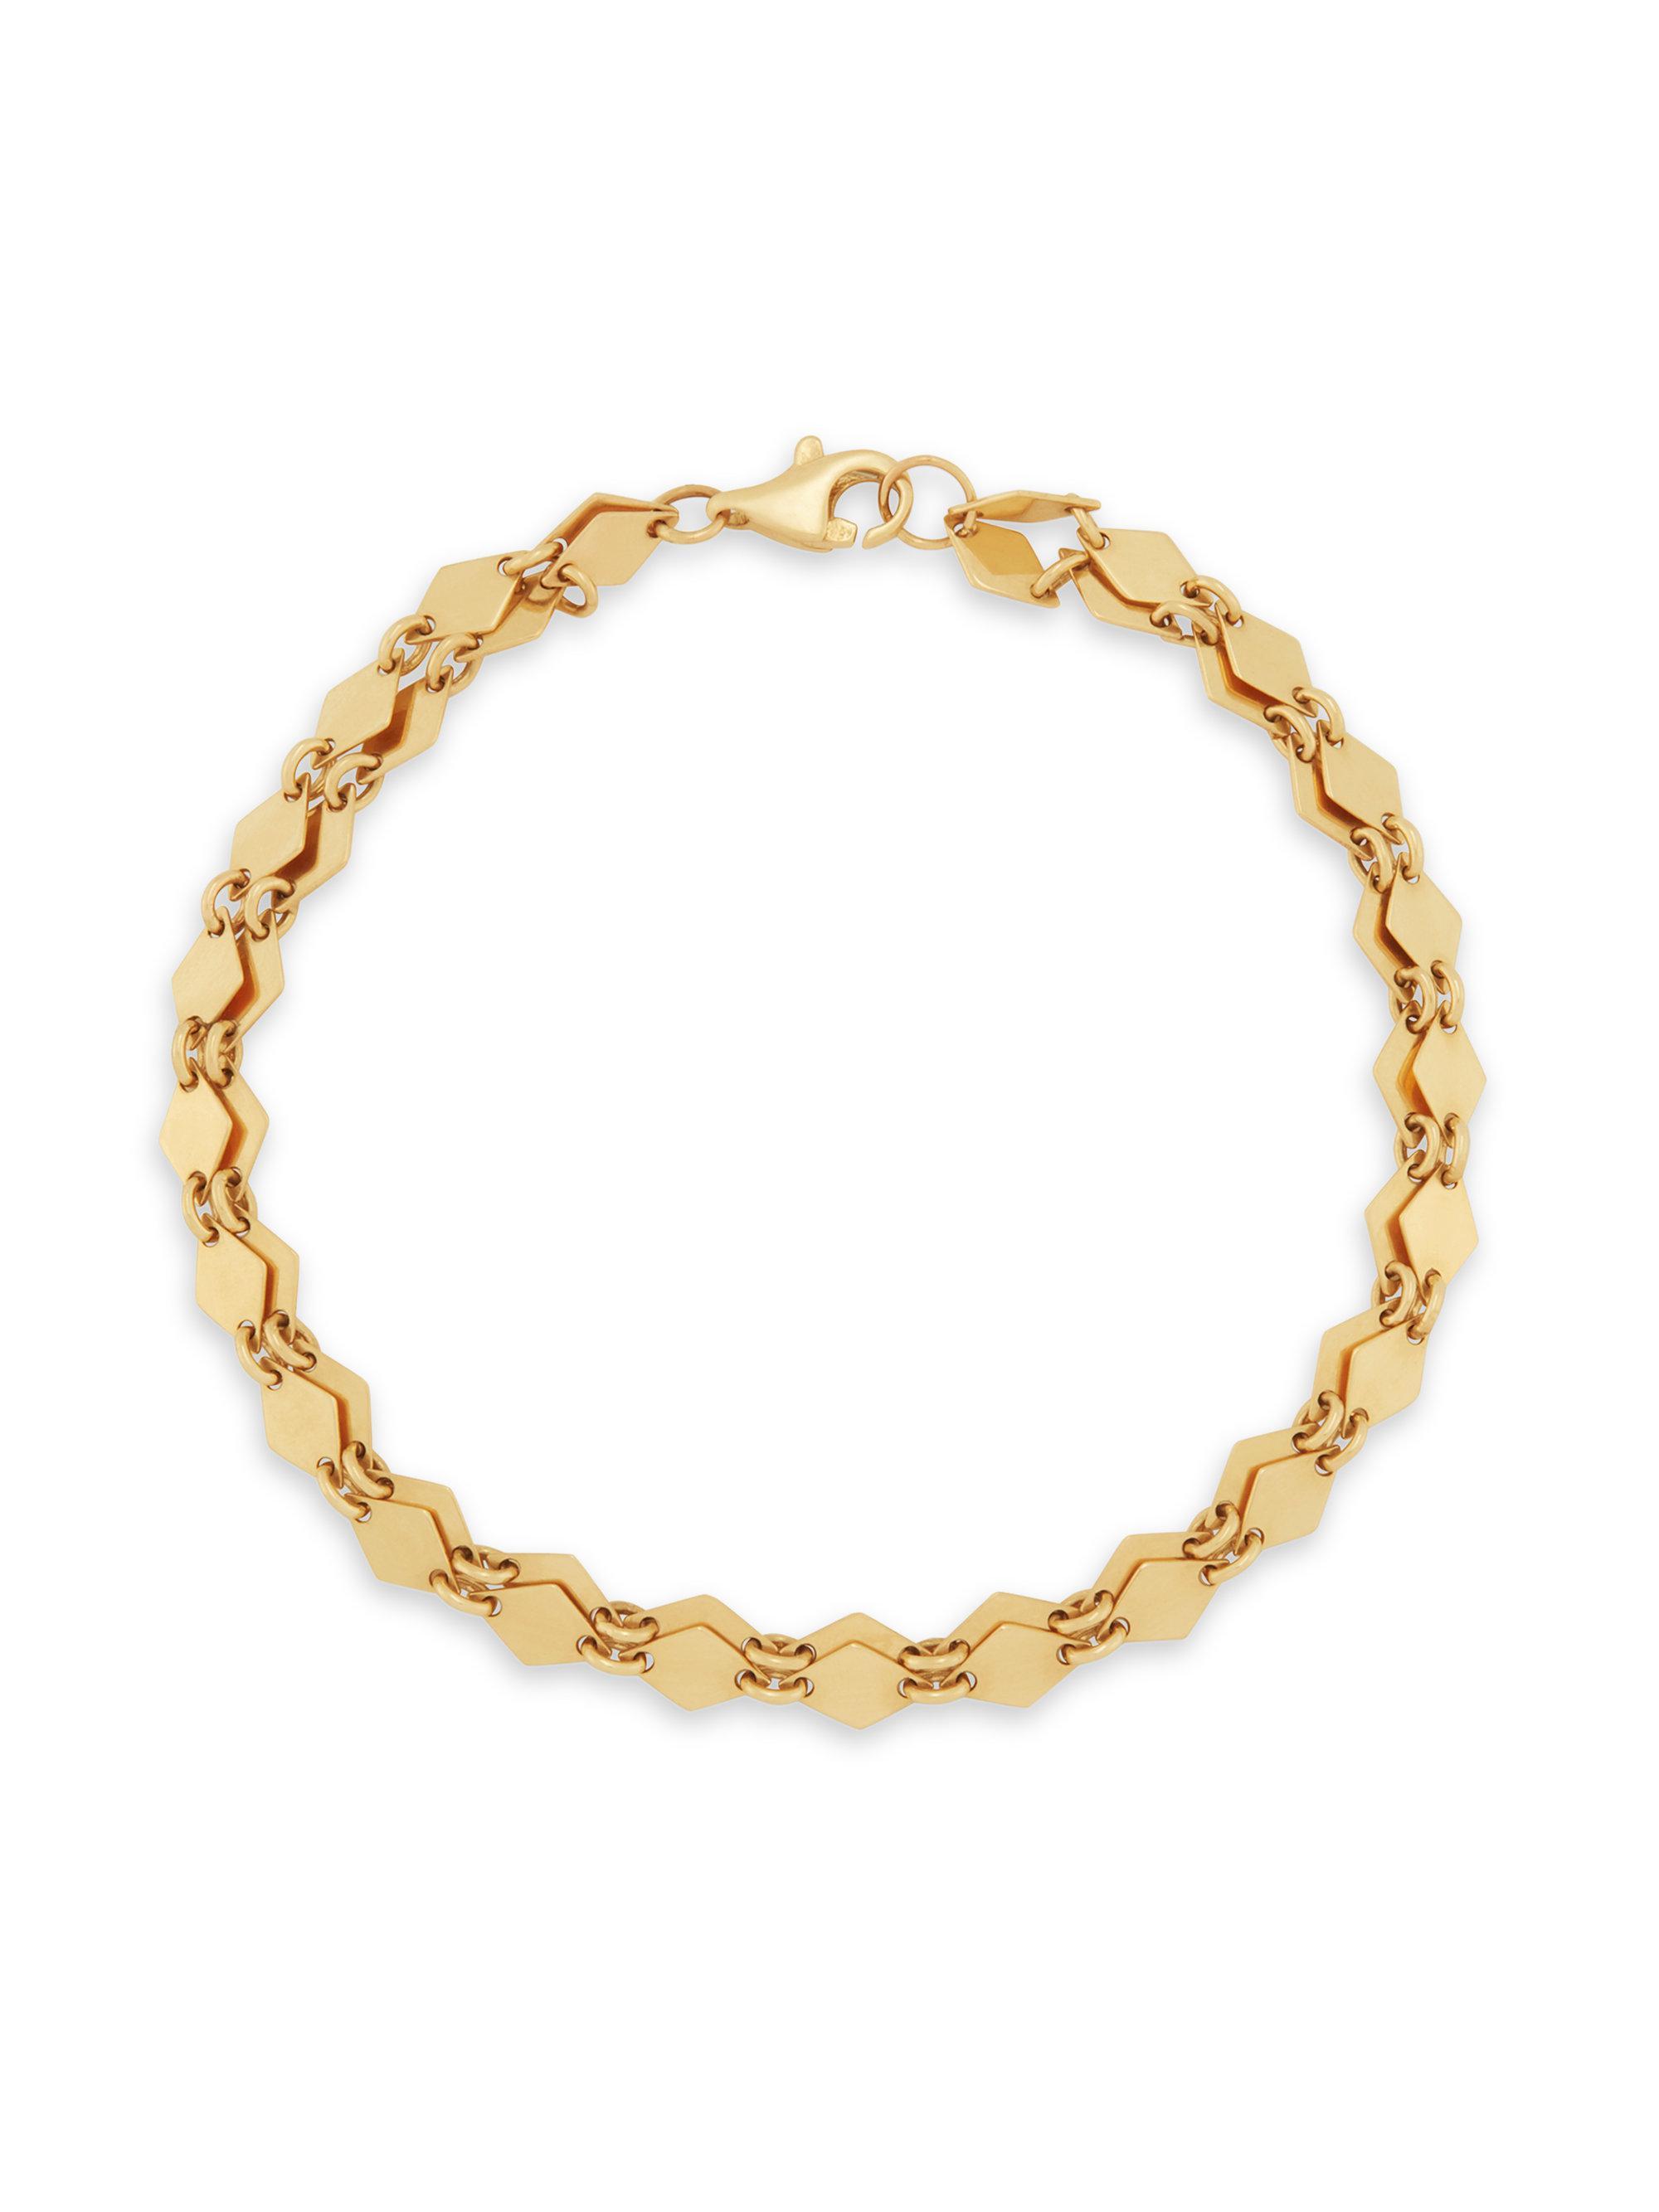 Lana Jewelry 14k Mini Kite Chain Bracelet m0d3Y